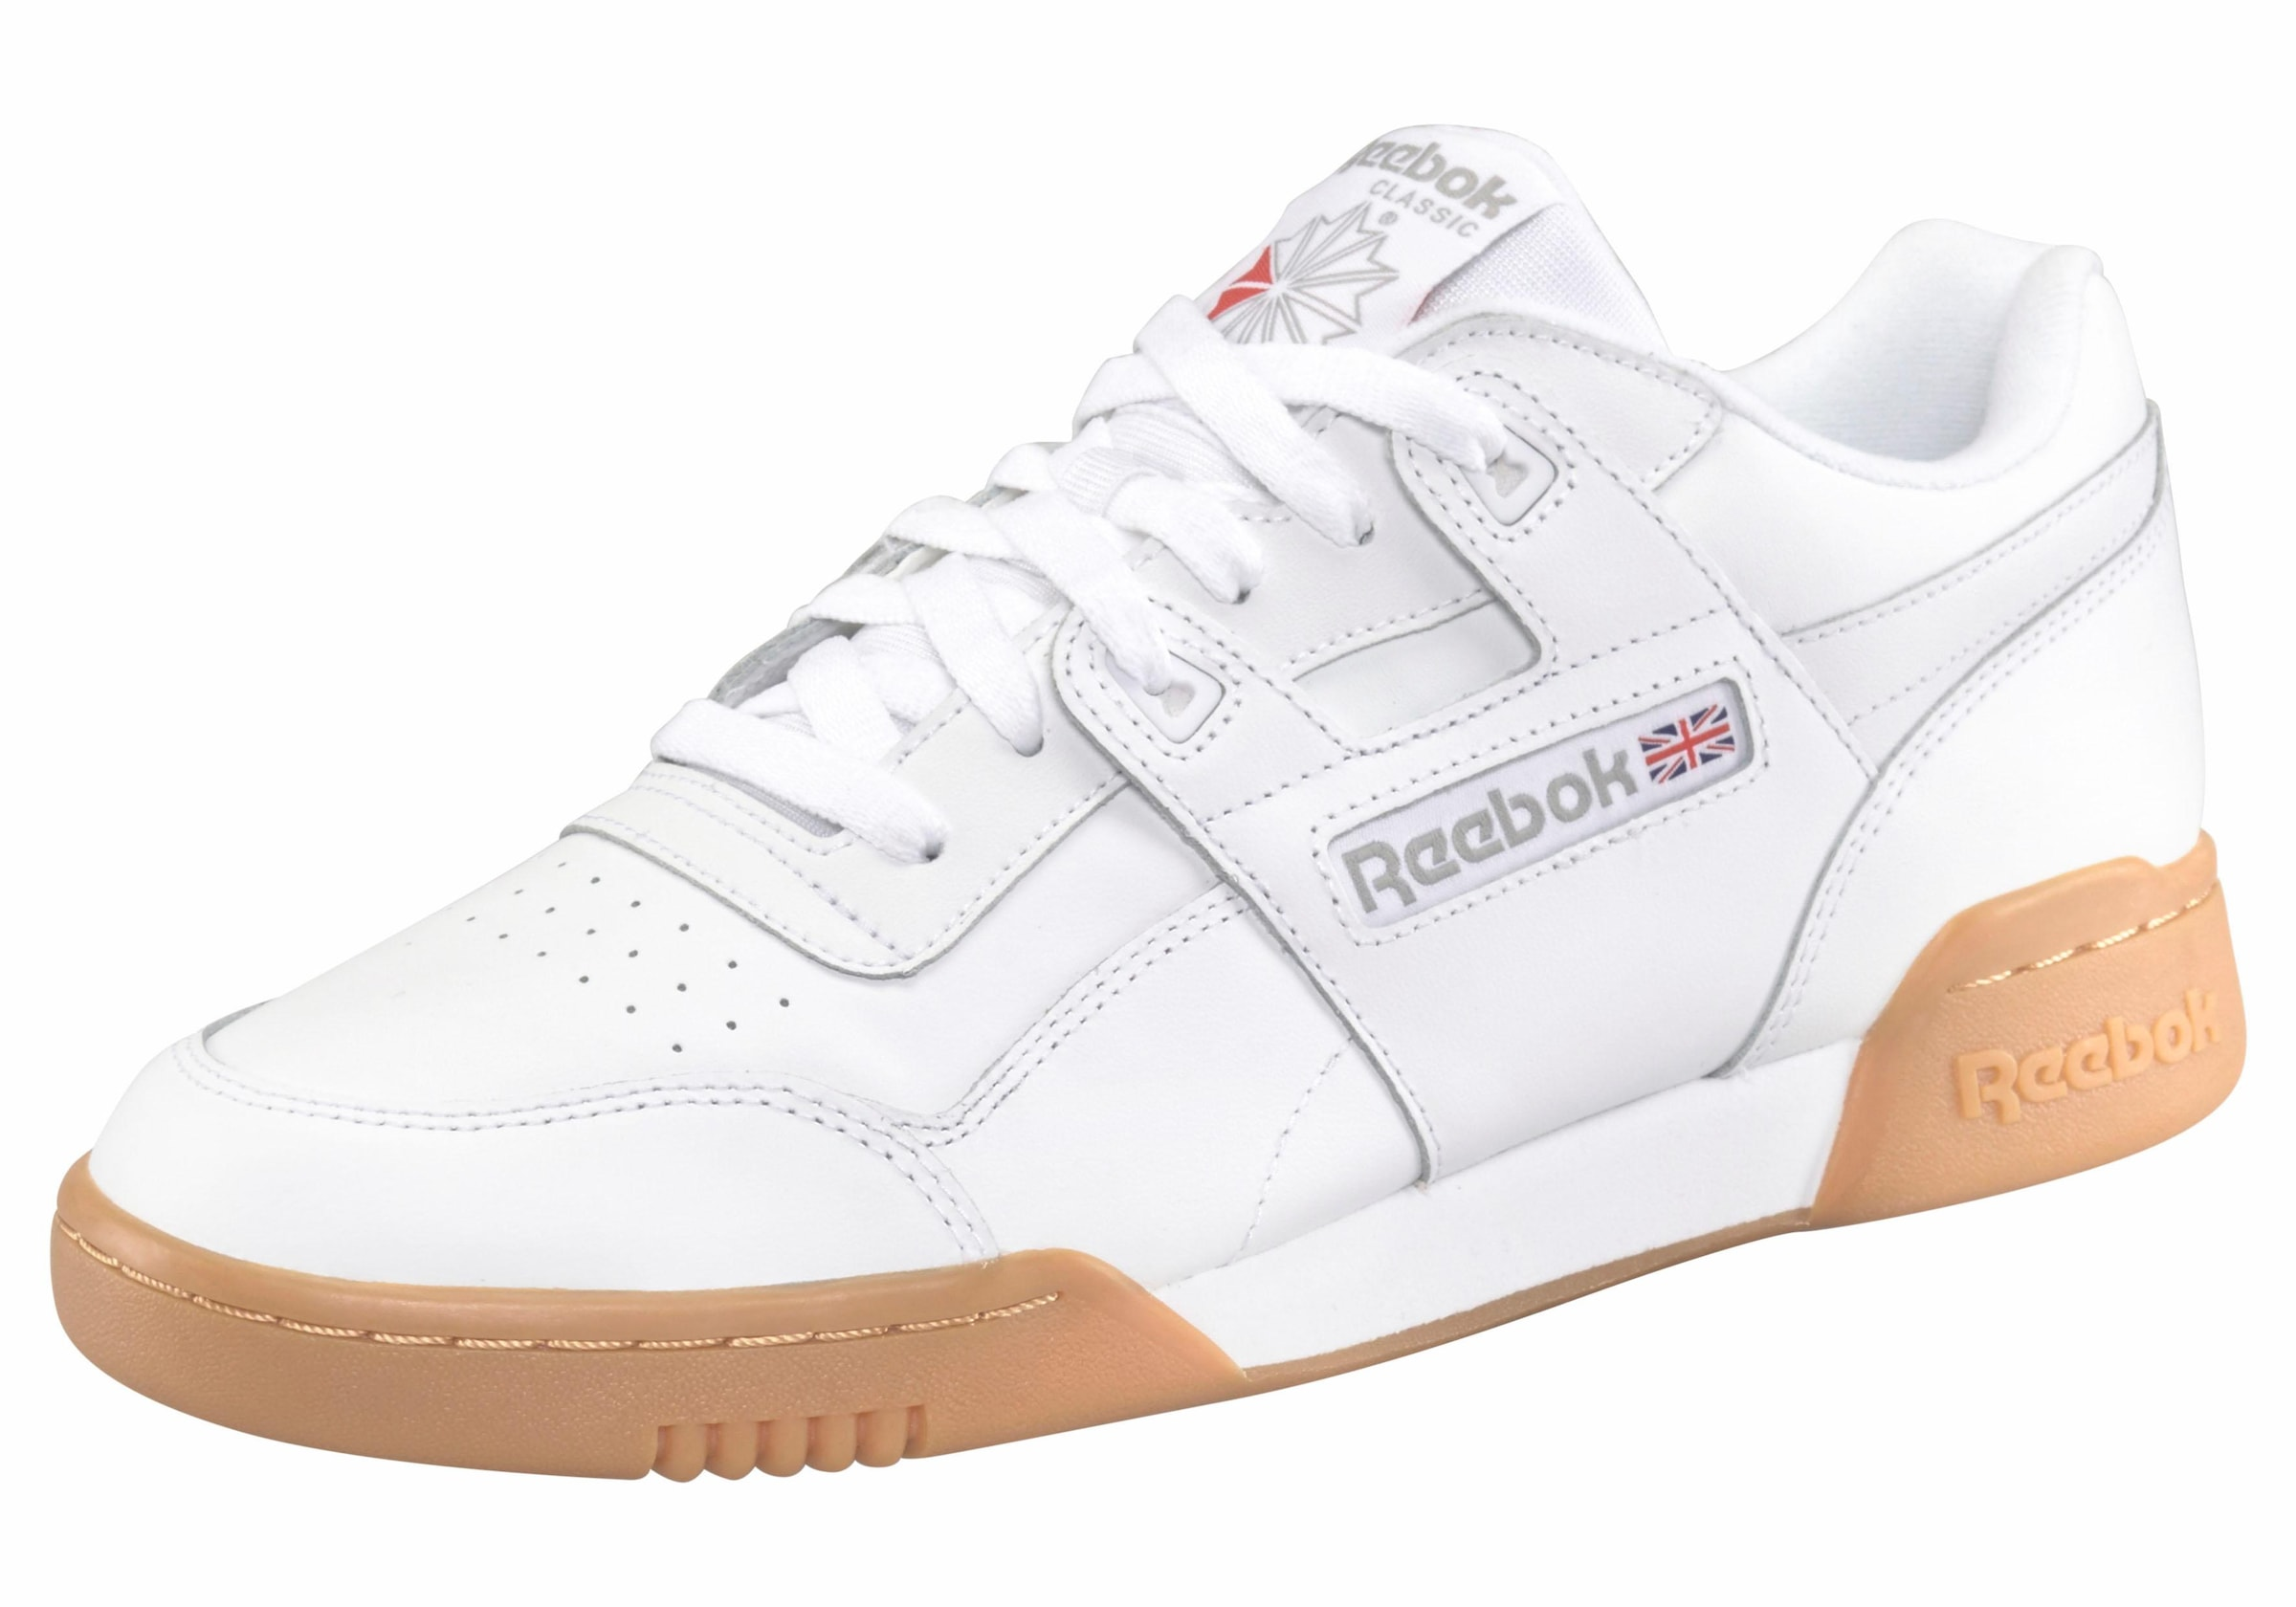 KaufenBaur Unisex« Plus Reebok »workout Classic Günstig Sneaker 5R4LAj